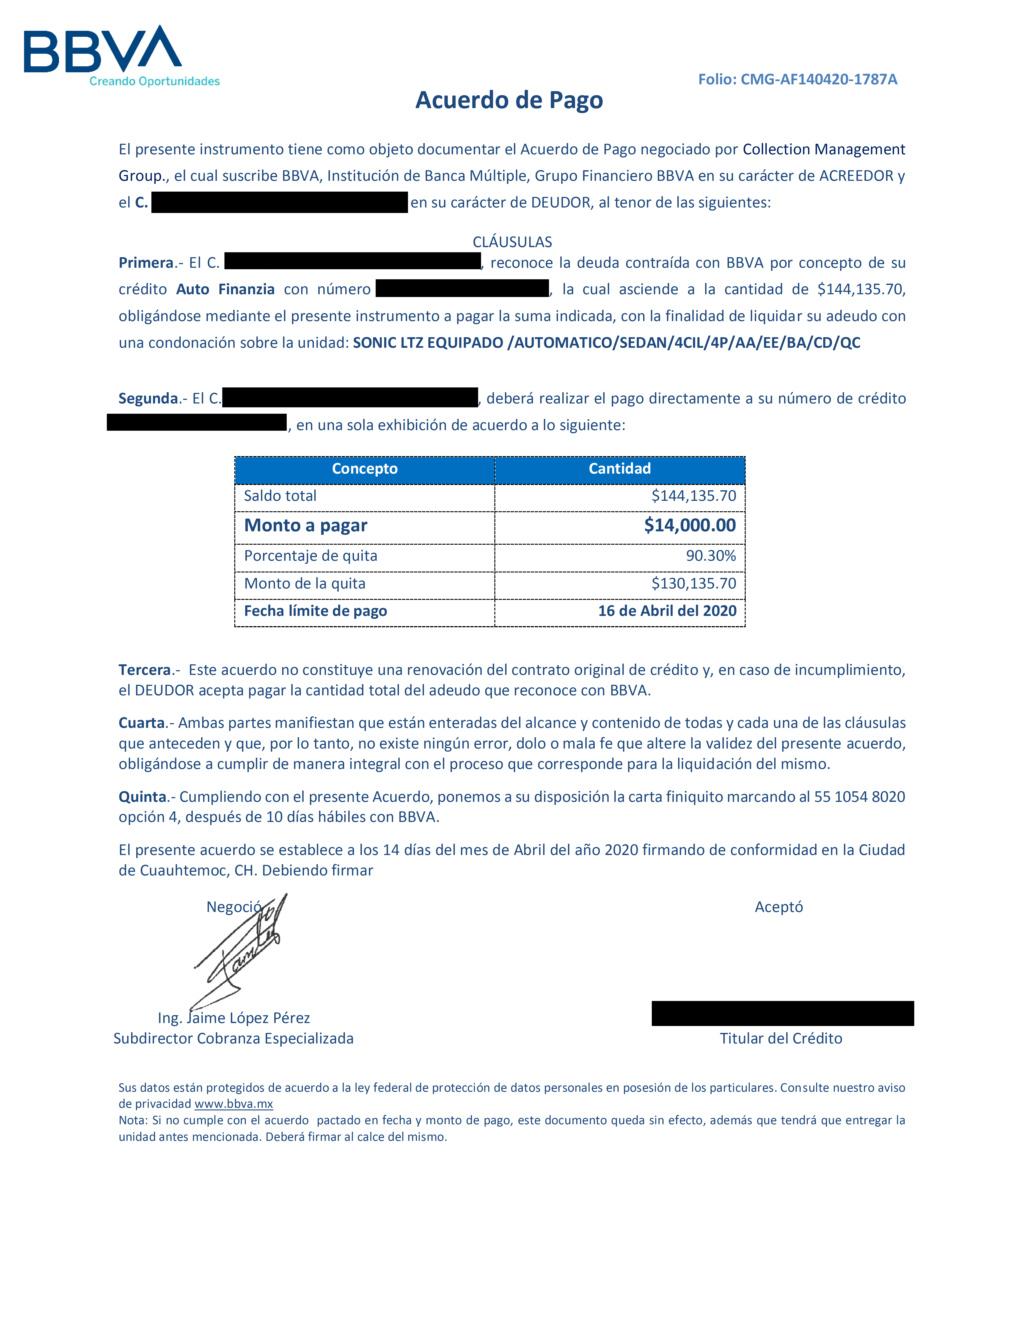 CREDITO AUTO BBVA DESPACHO CMG Captur10